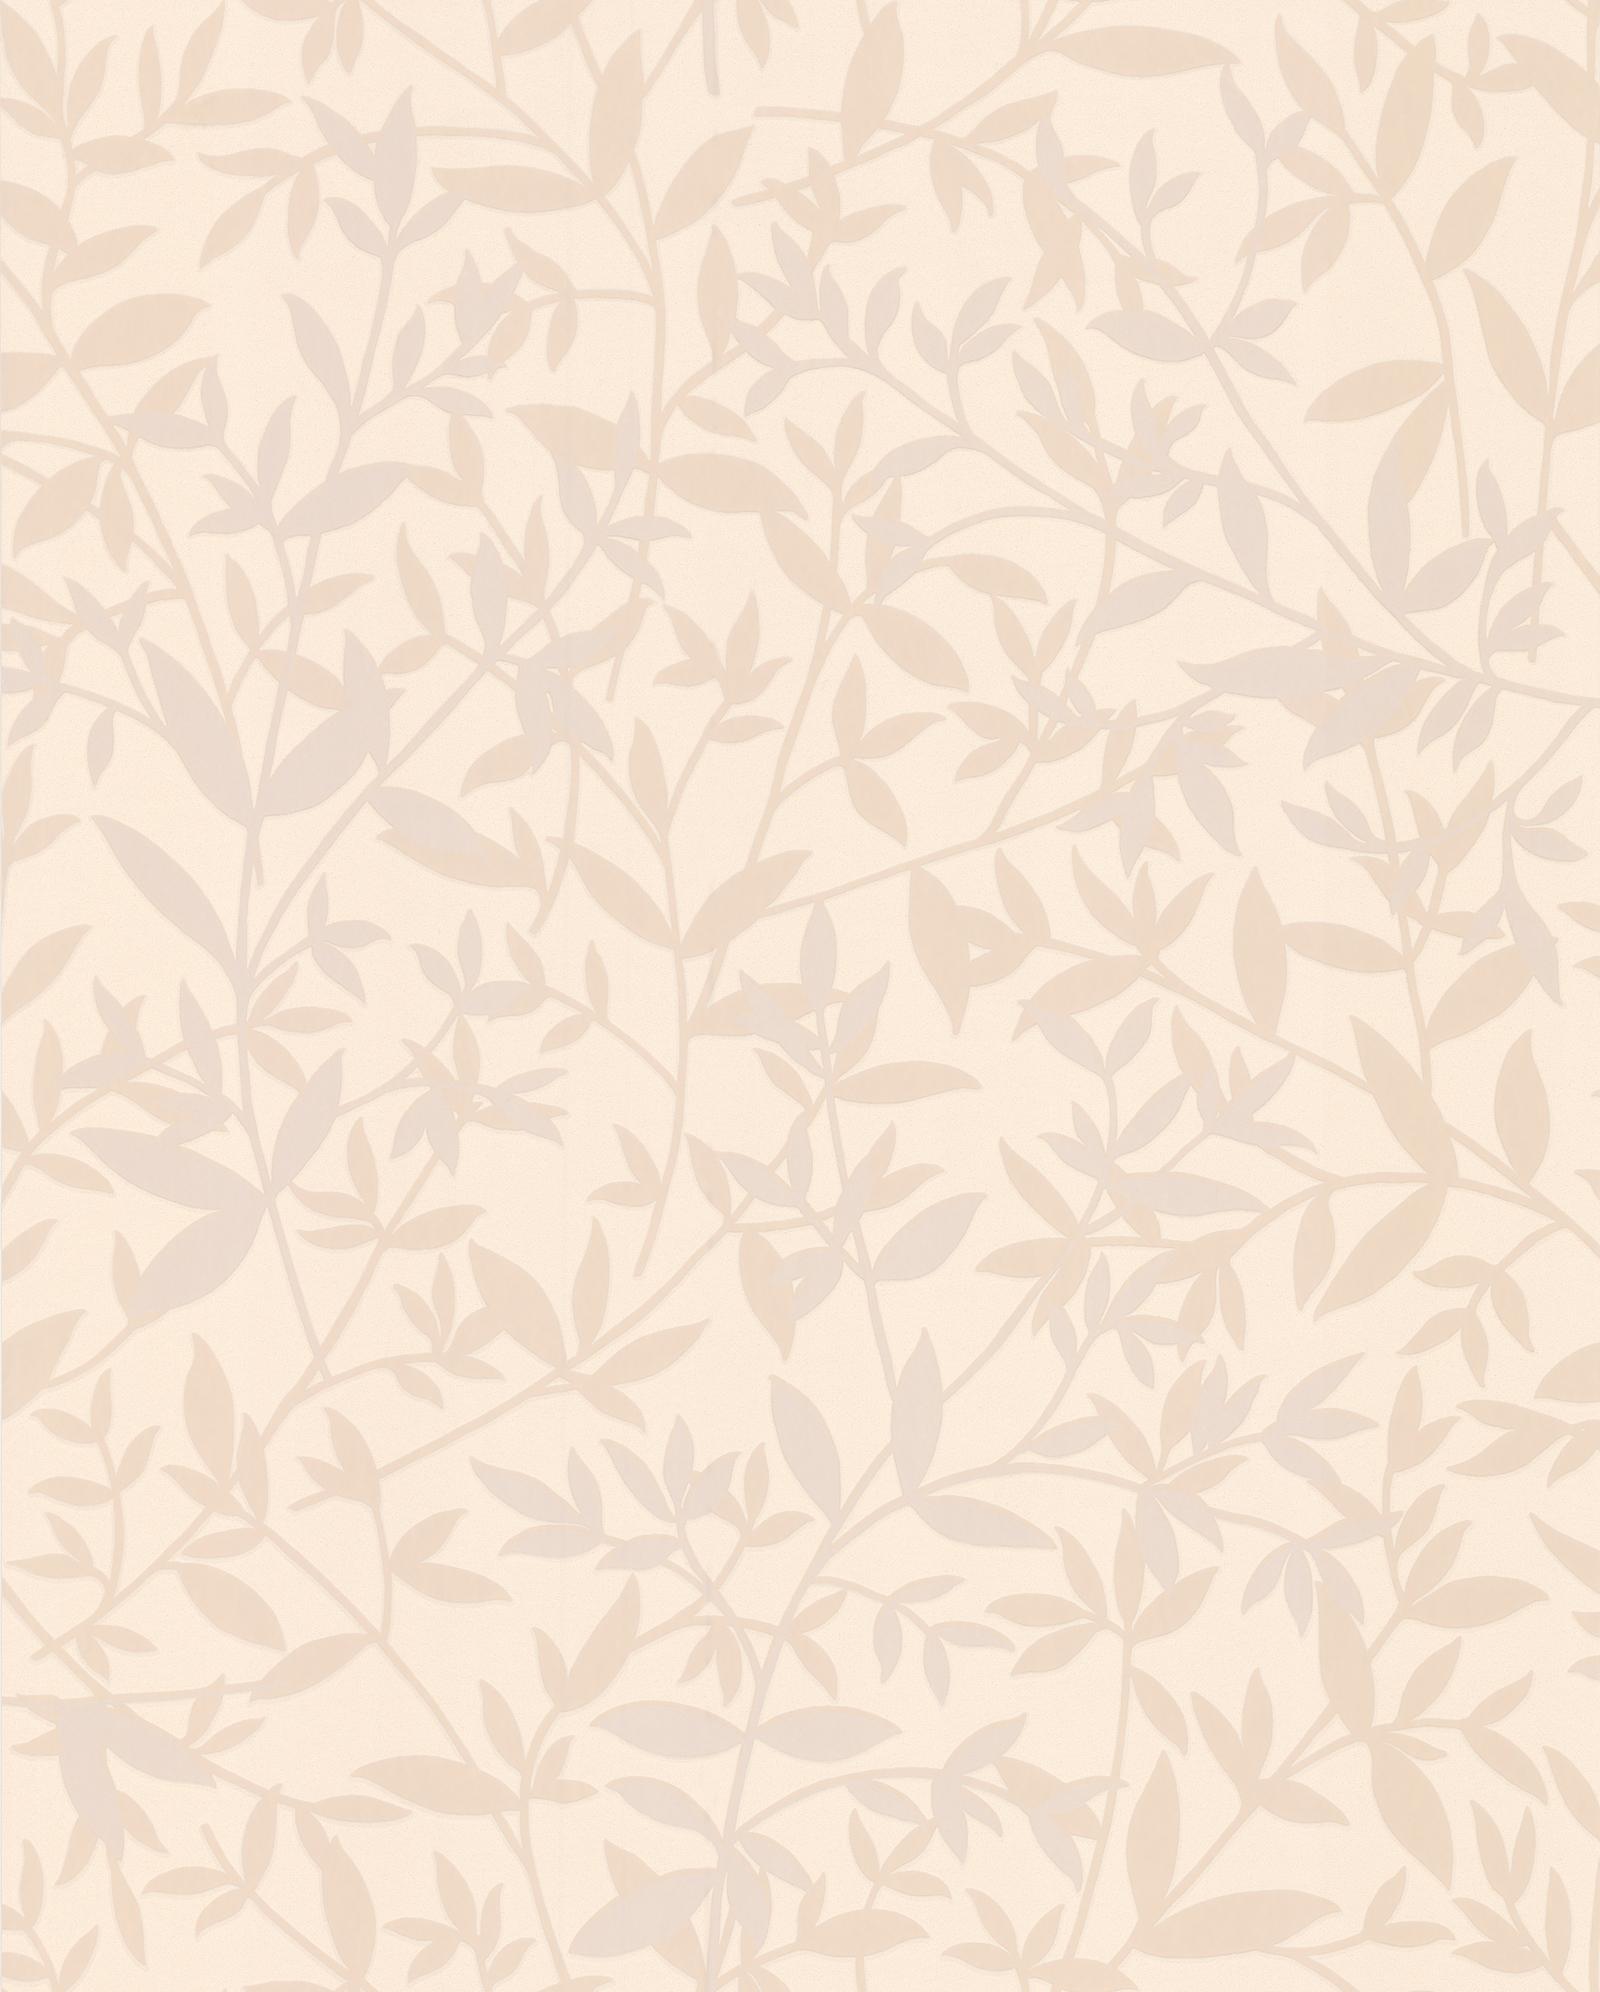 Beige Wallpaper with Subtle Pattern - WallpaperSafari